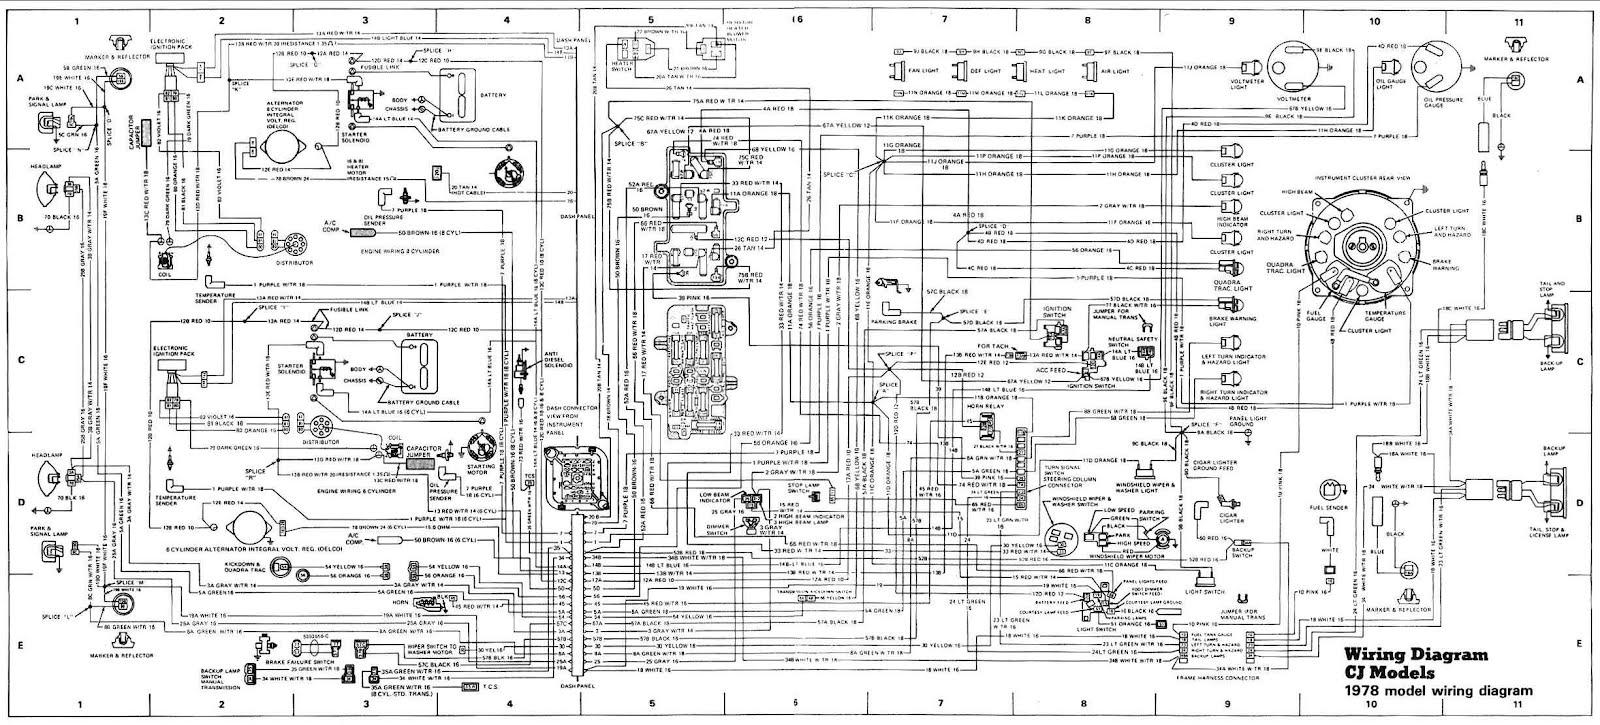 Wiring Diagram For Jeep Cj7 - Wiring Diagram